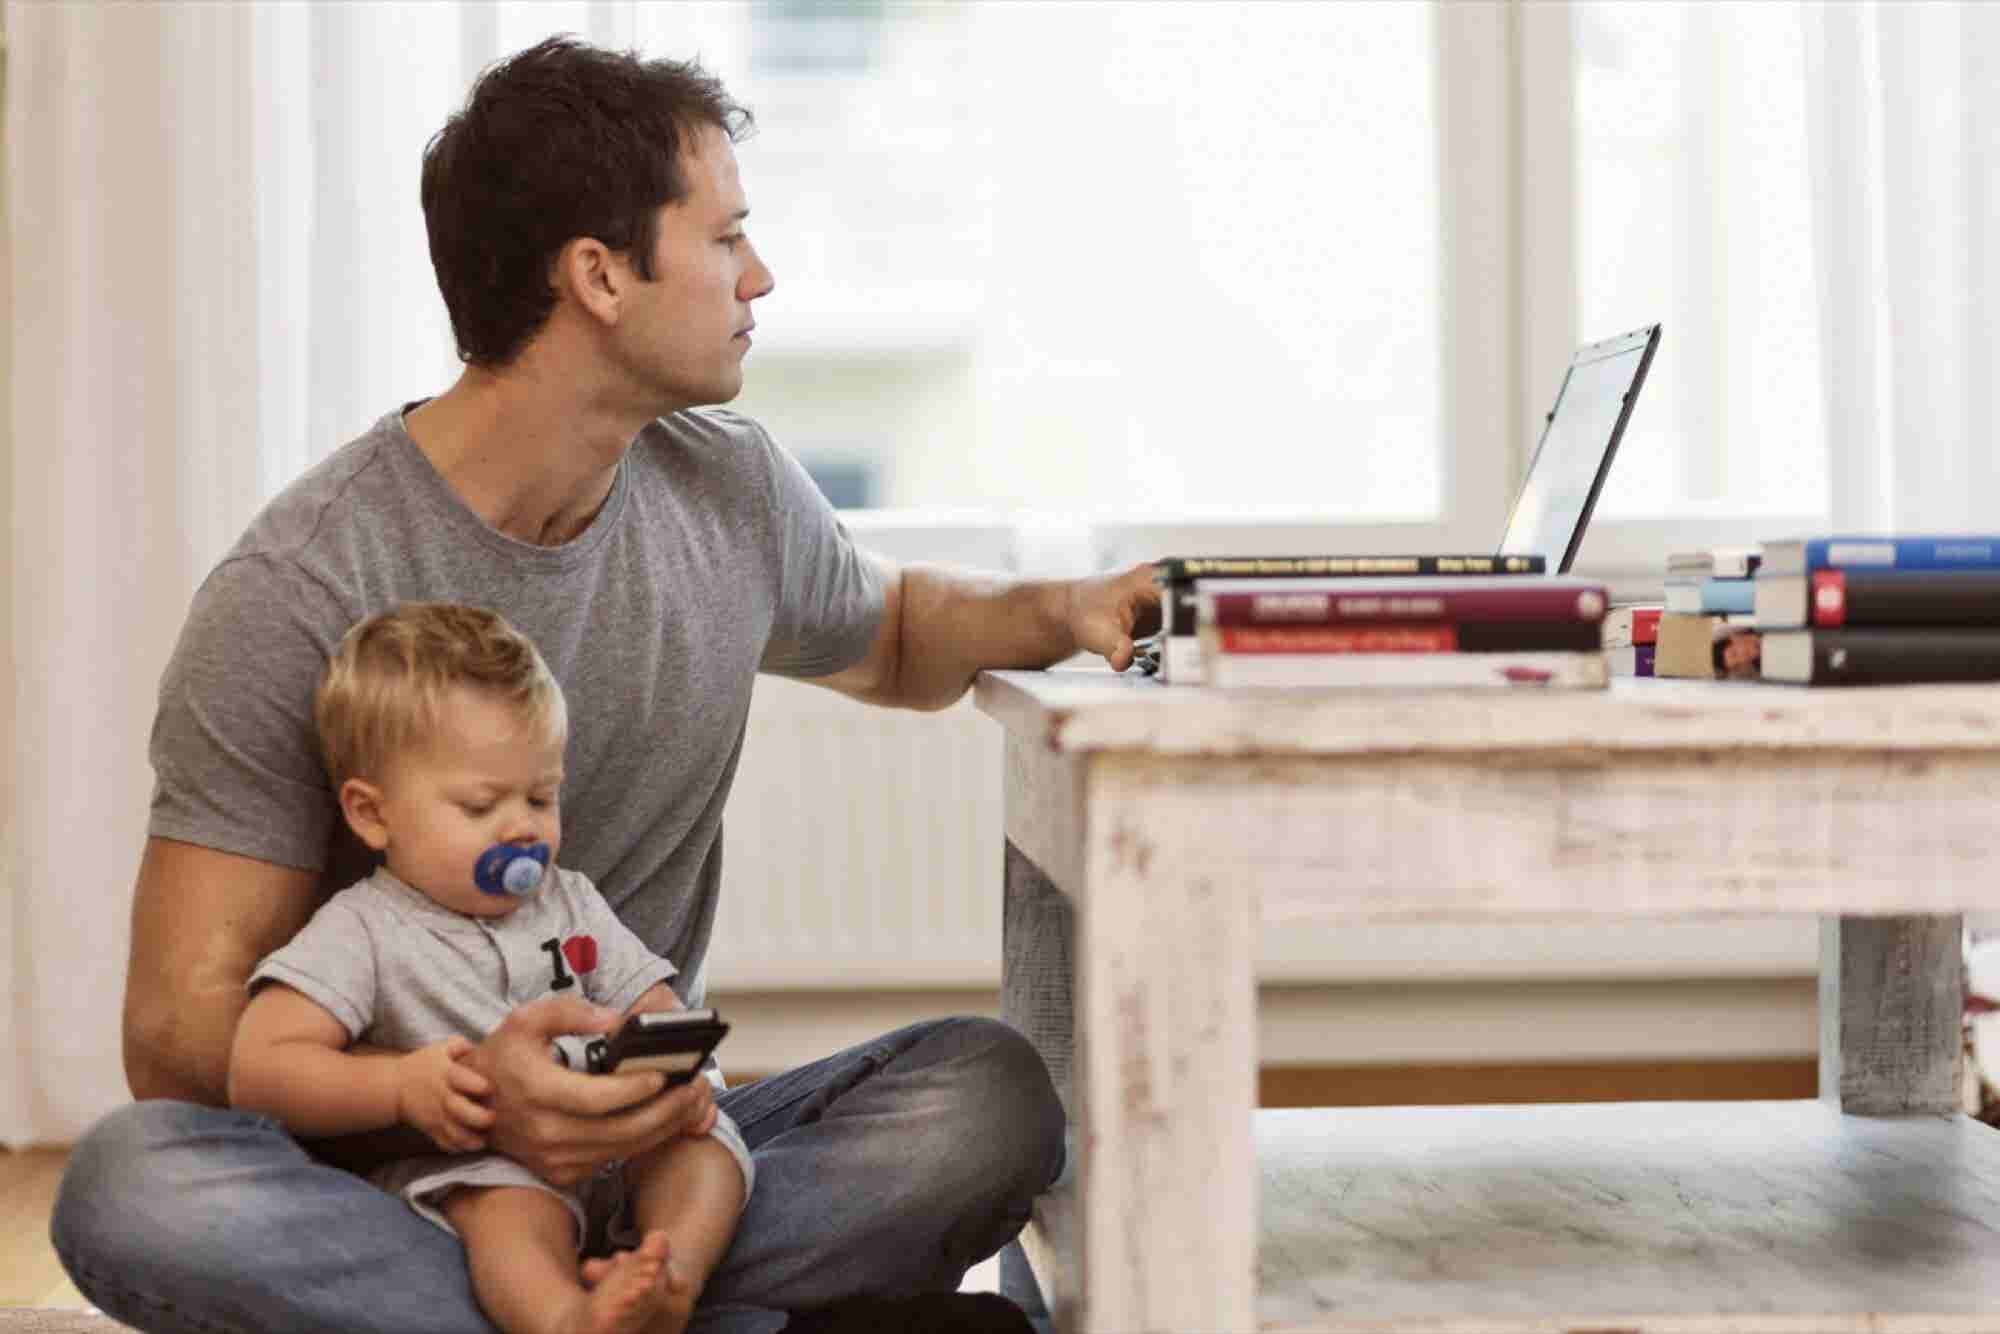 The Downside of Work-Life Balance